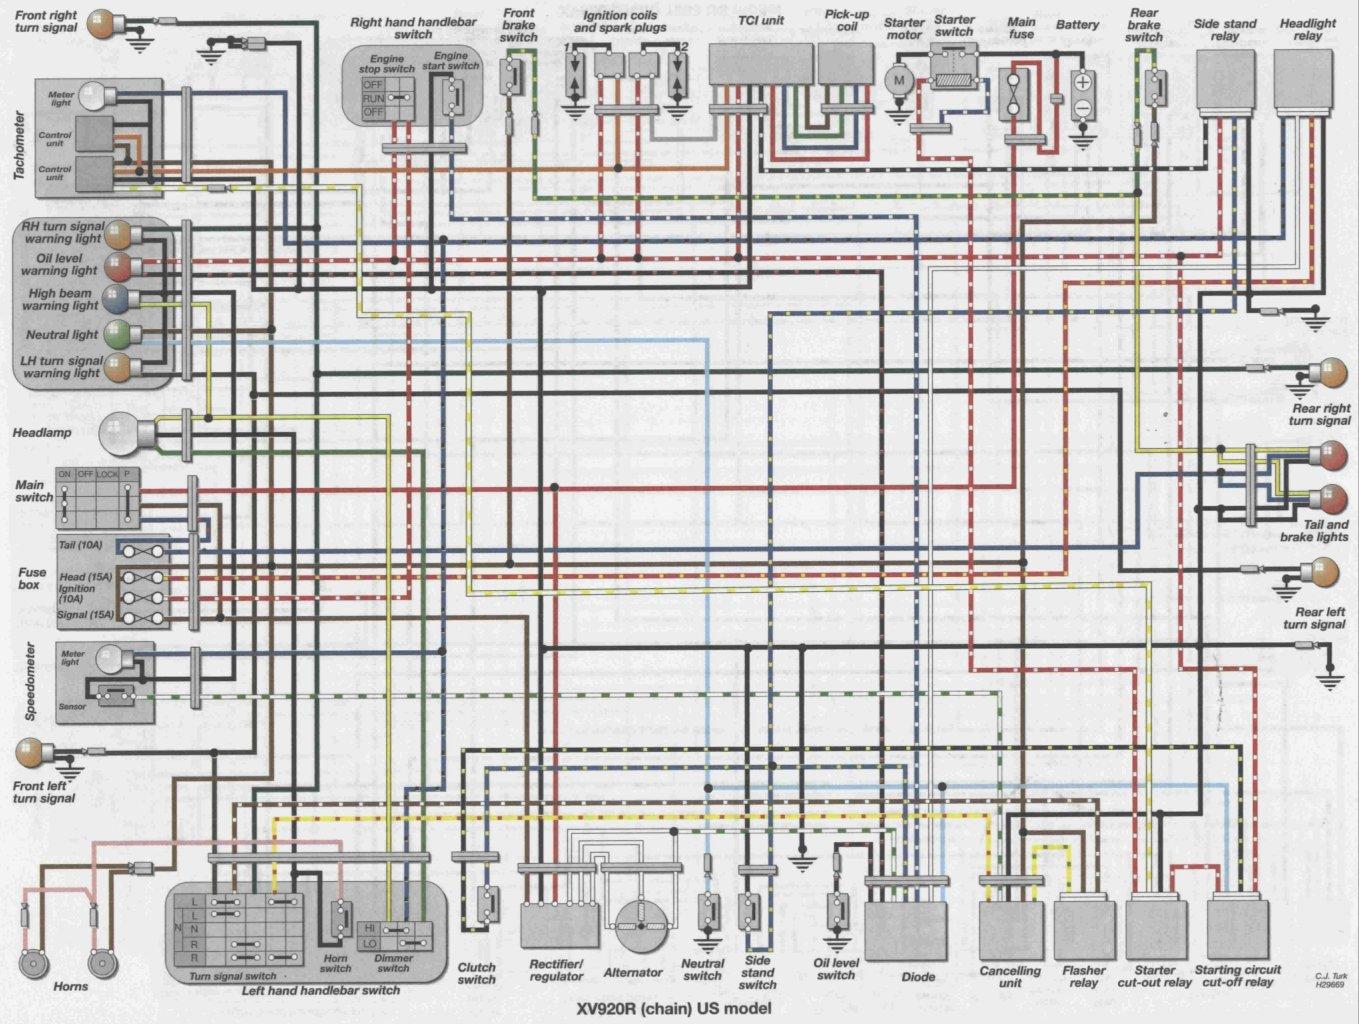 Wiring Diagram Nmax Free Download Wiring Diagram | Xwiaw wiring low ...